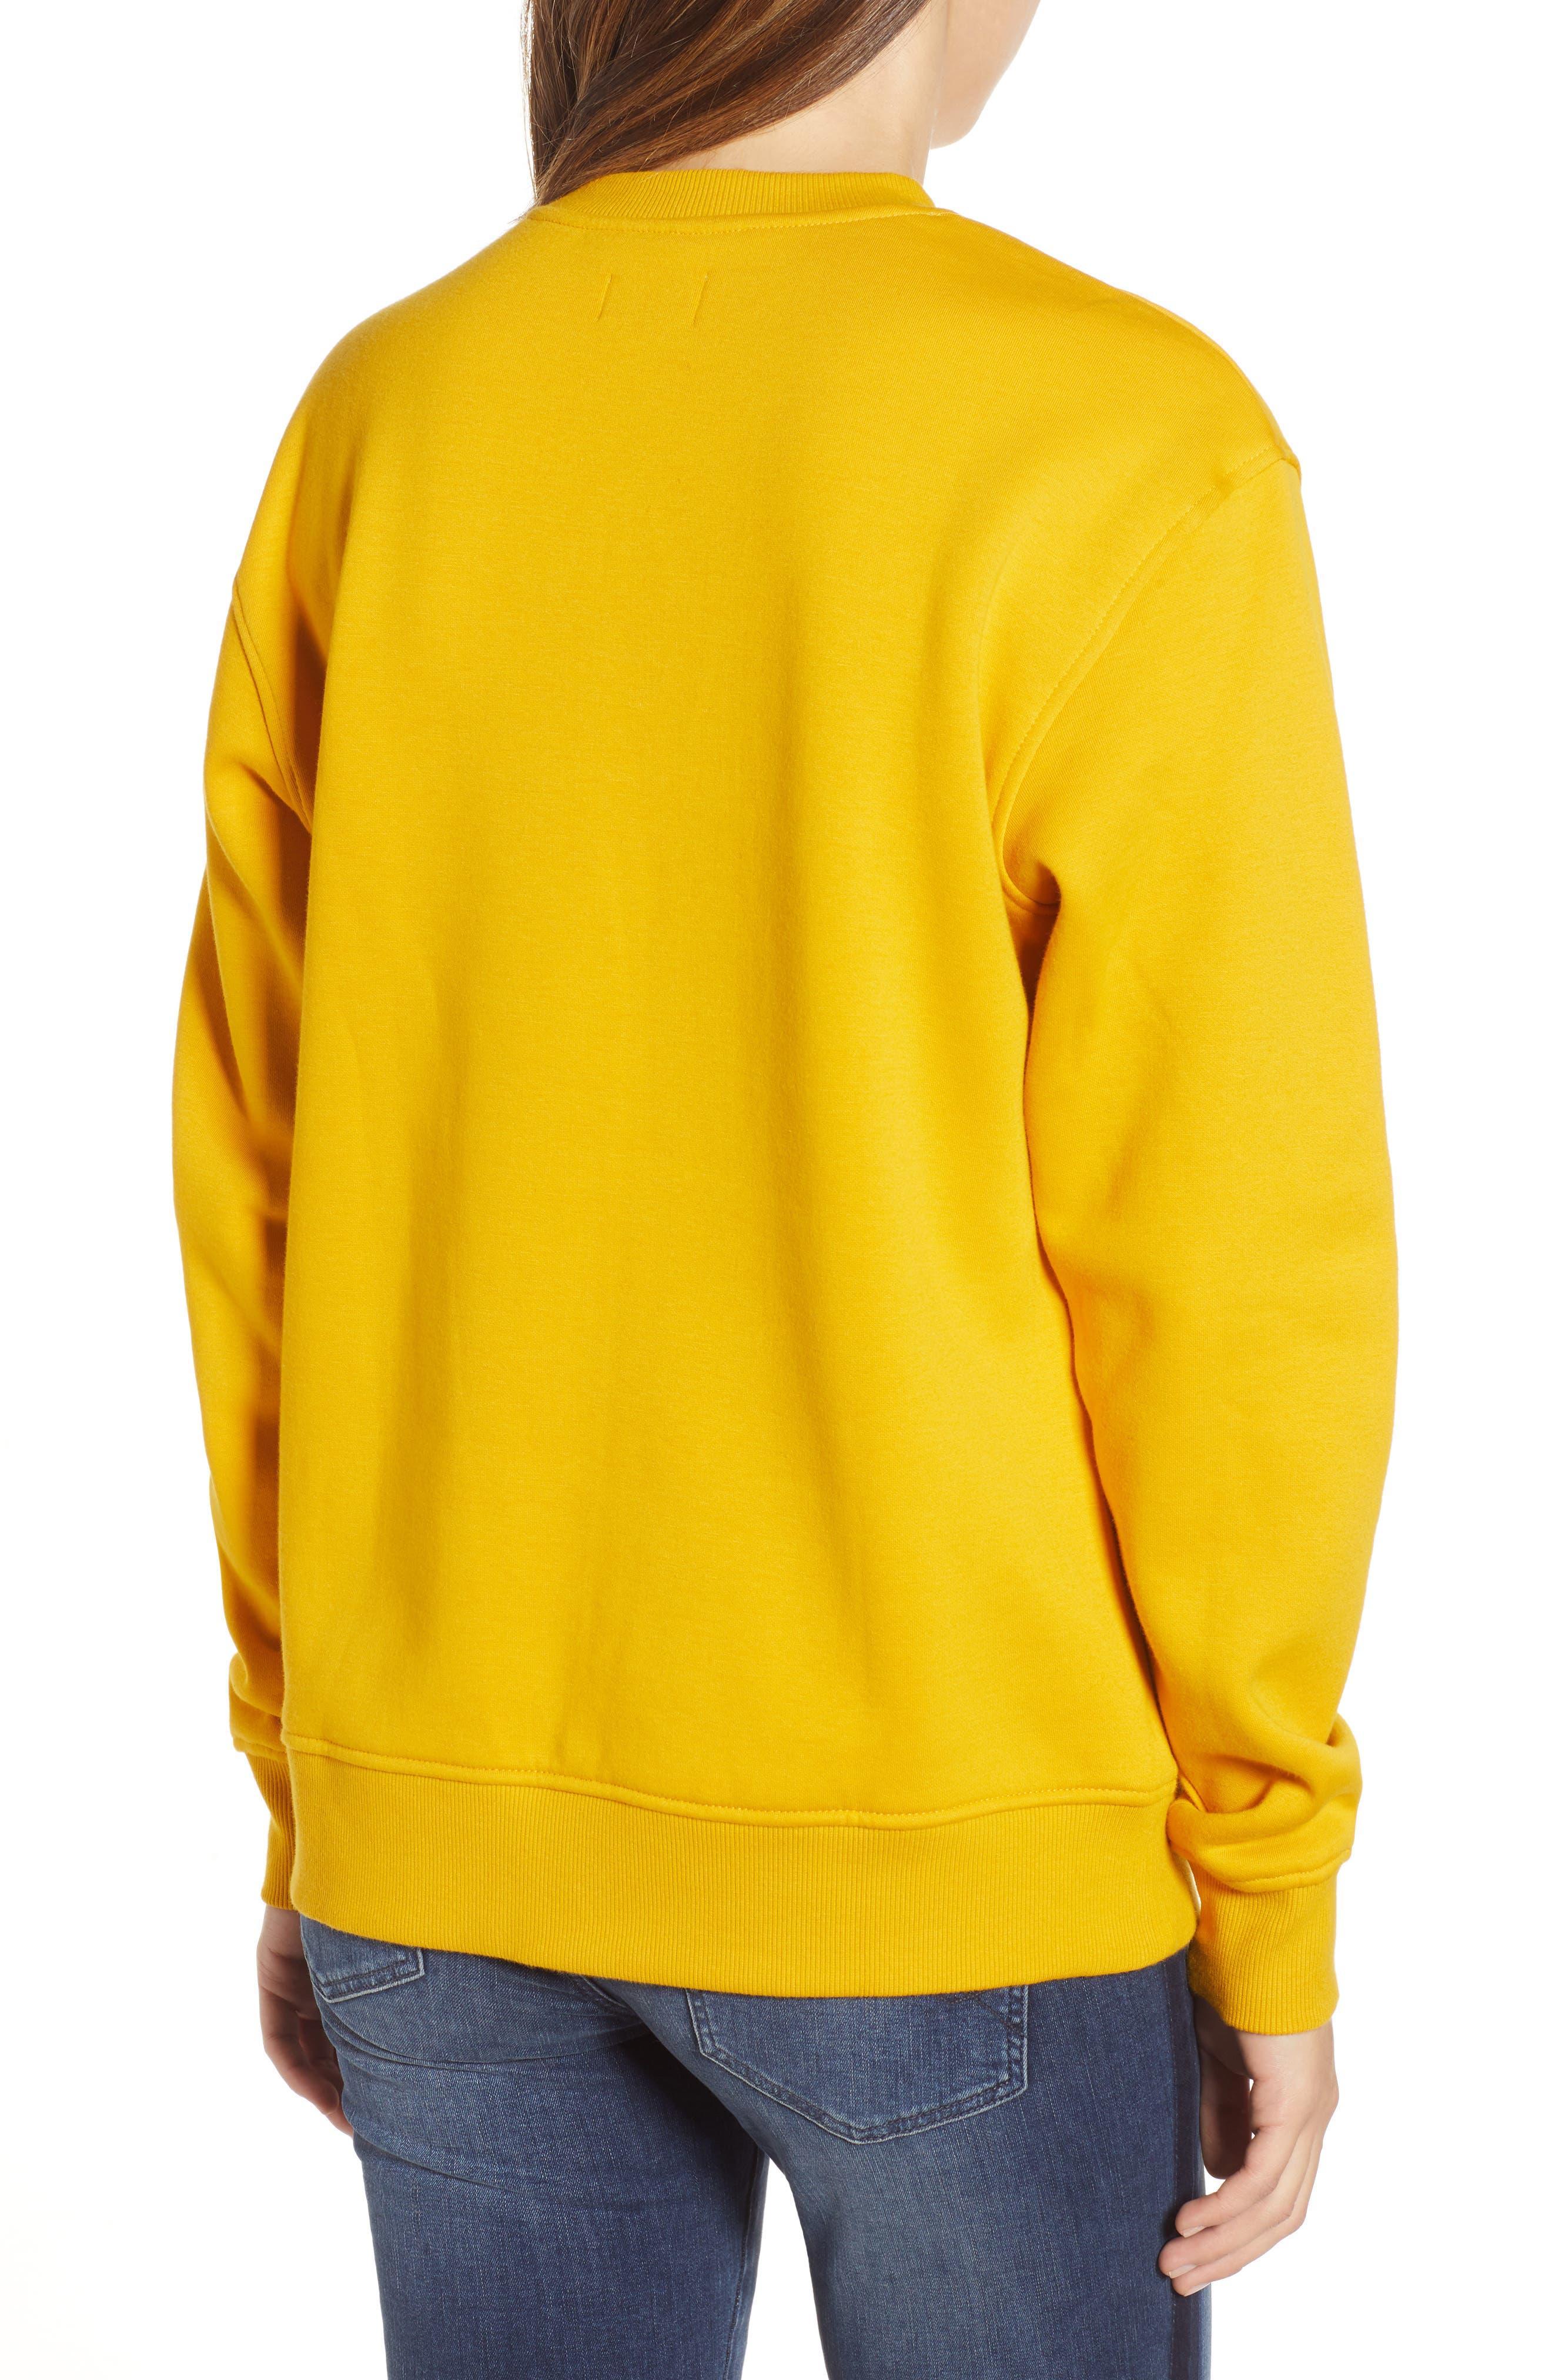 TJW Tommy Classics Sweatshirt,                             Alternate thumbnail 2, color,                             701